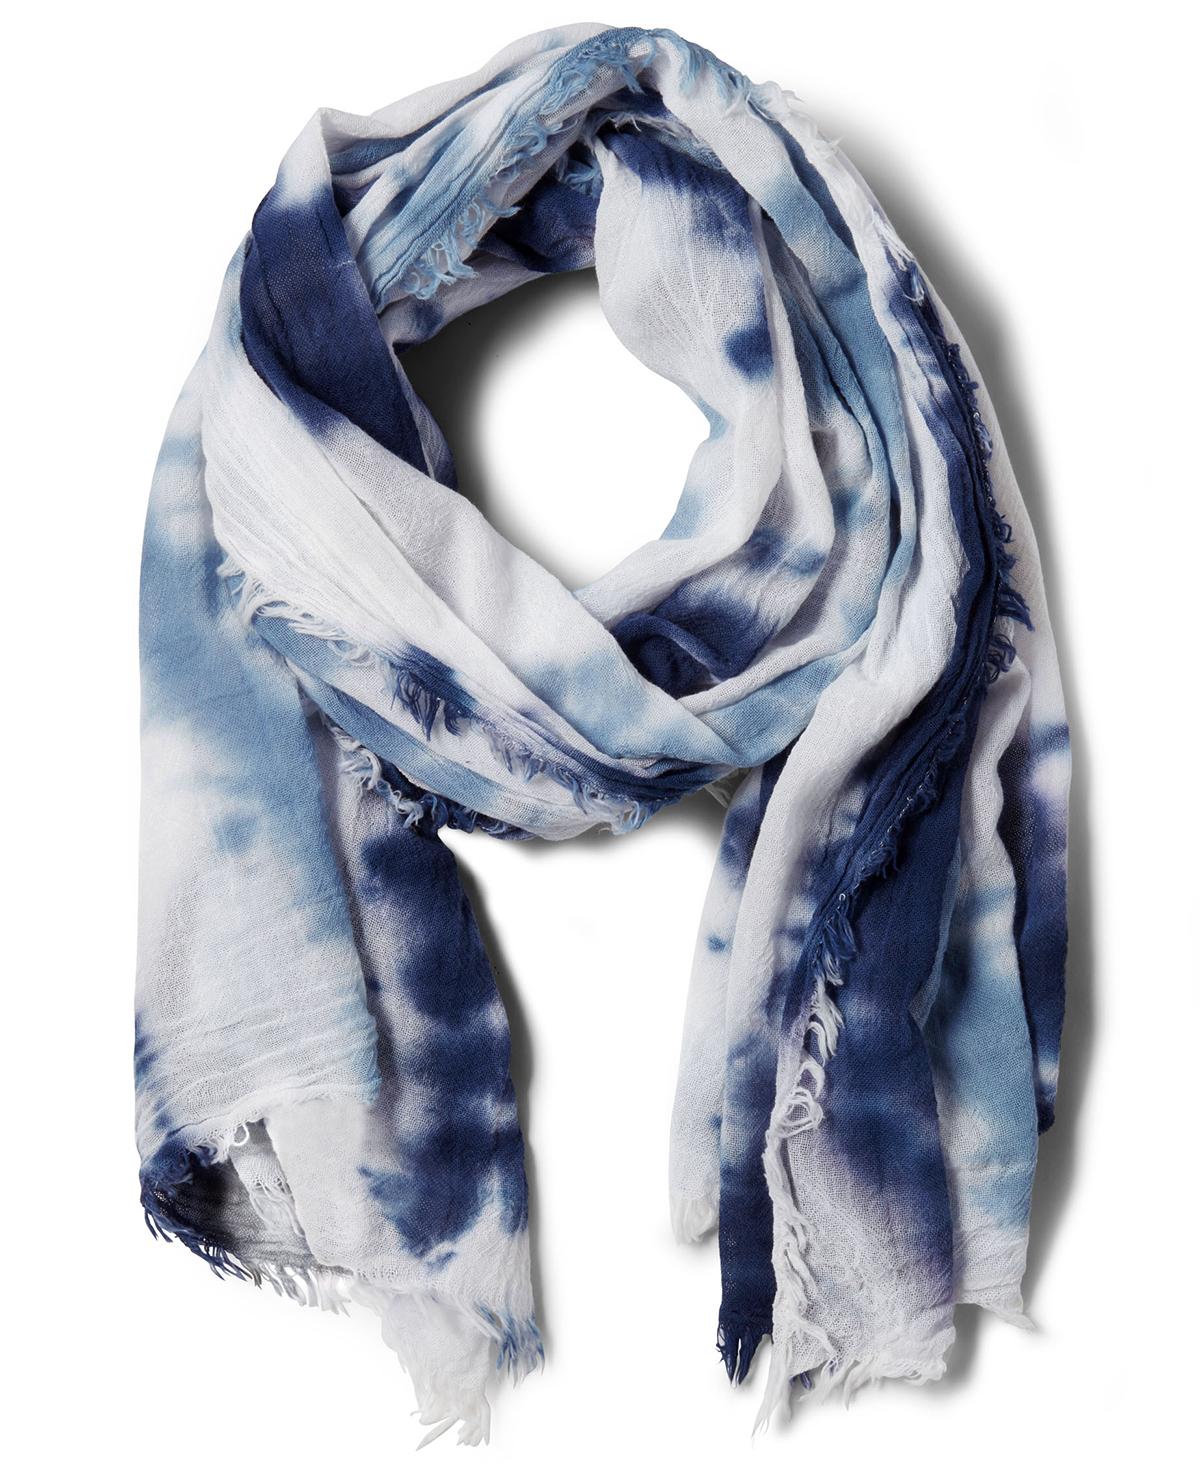 aerie tie-dye scarf